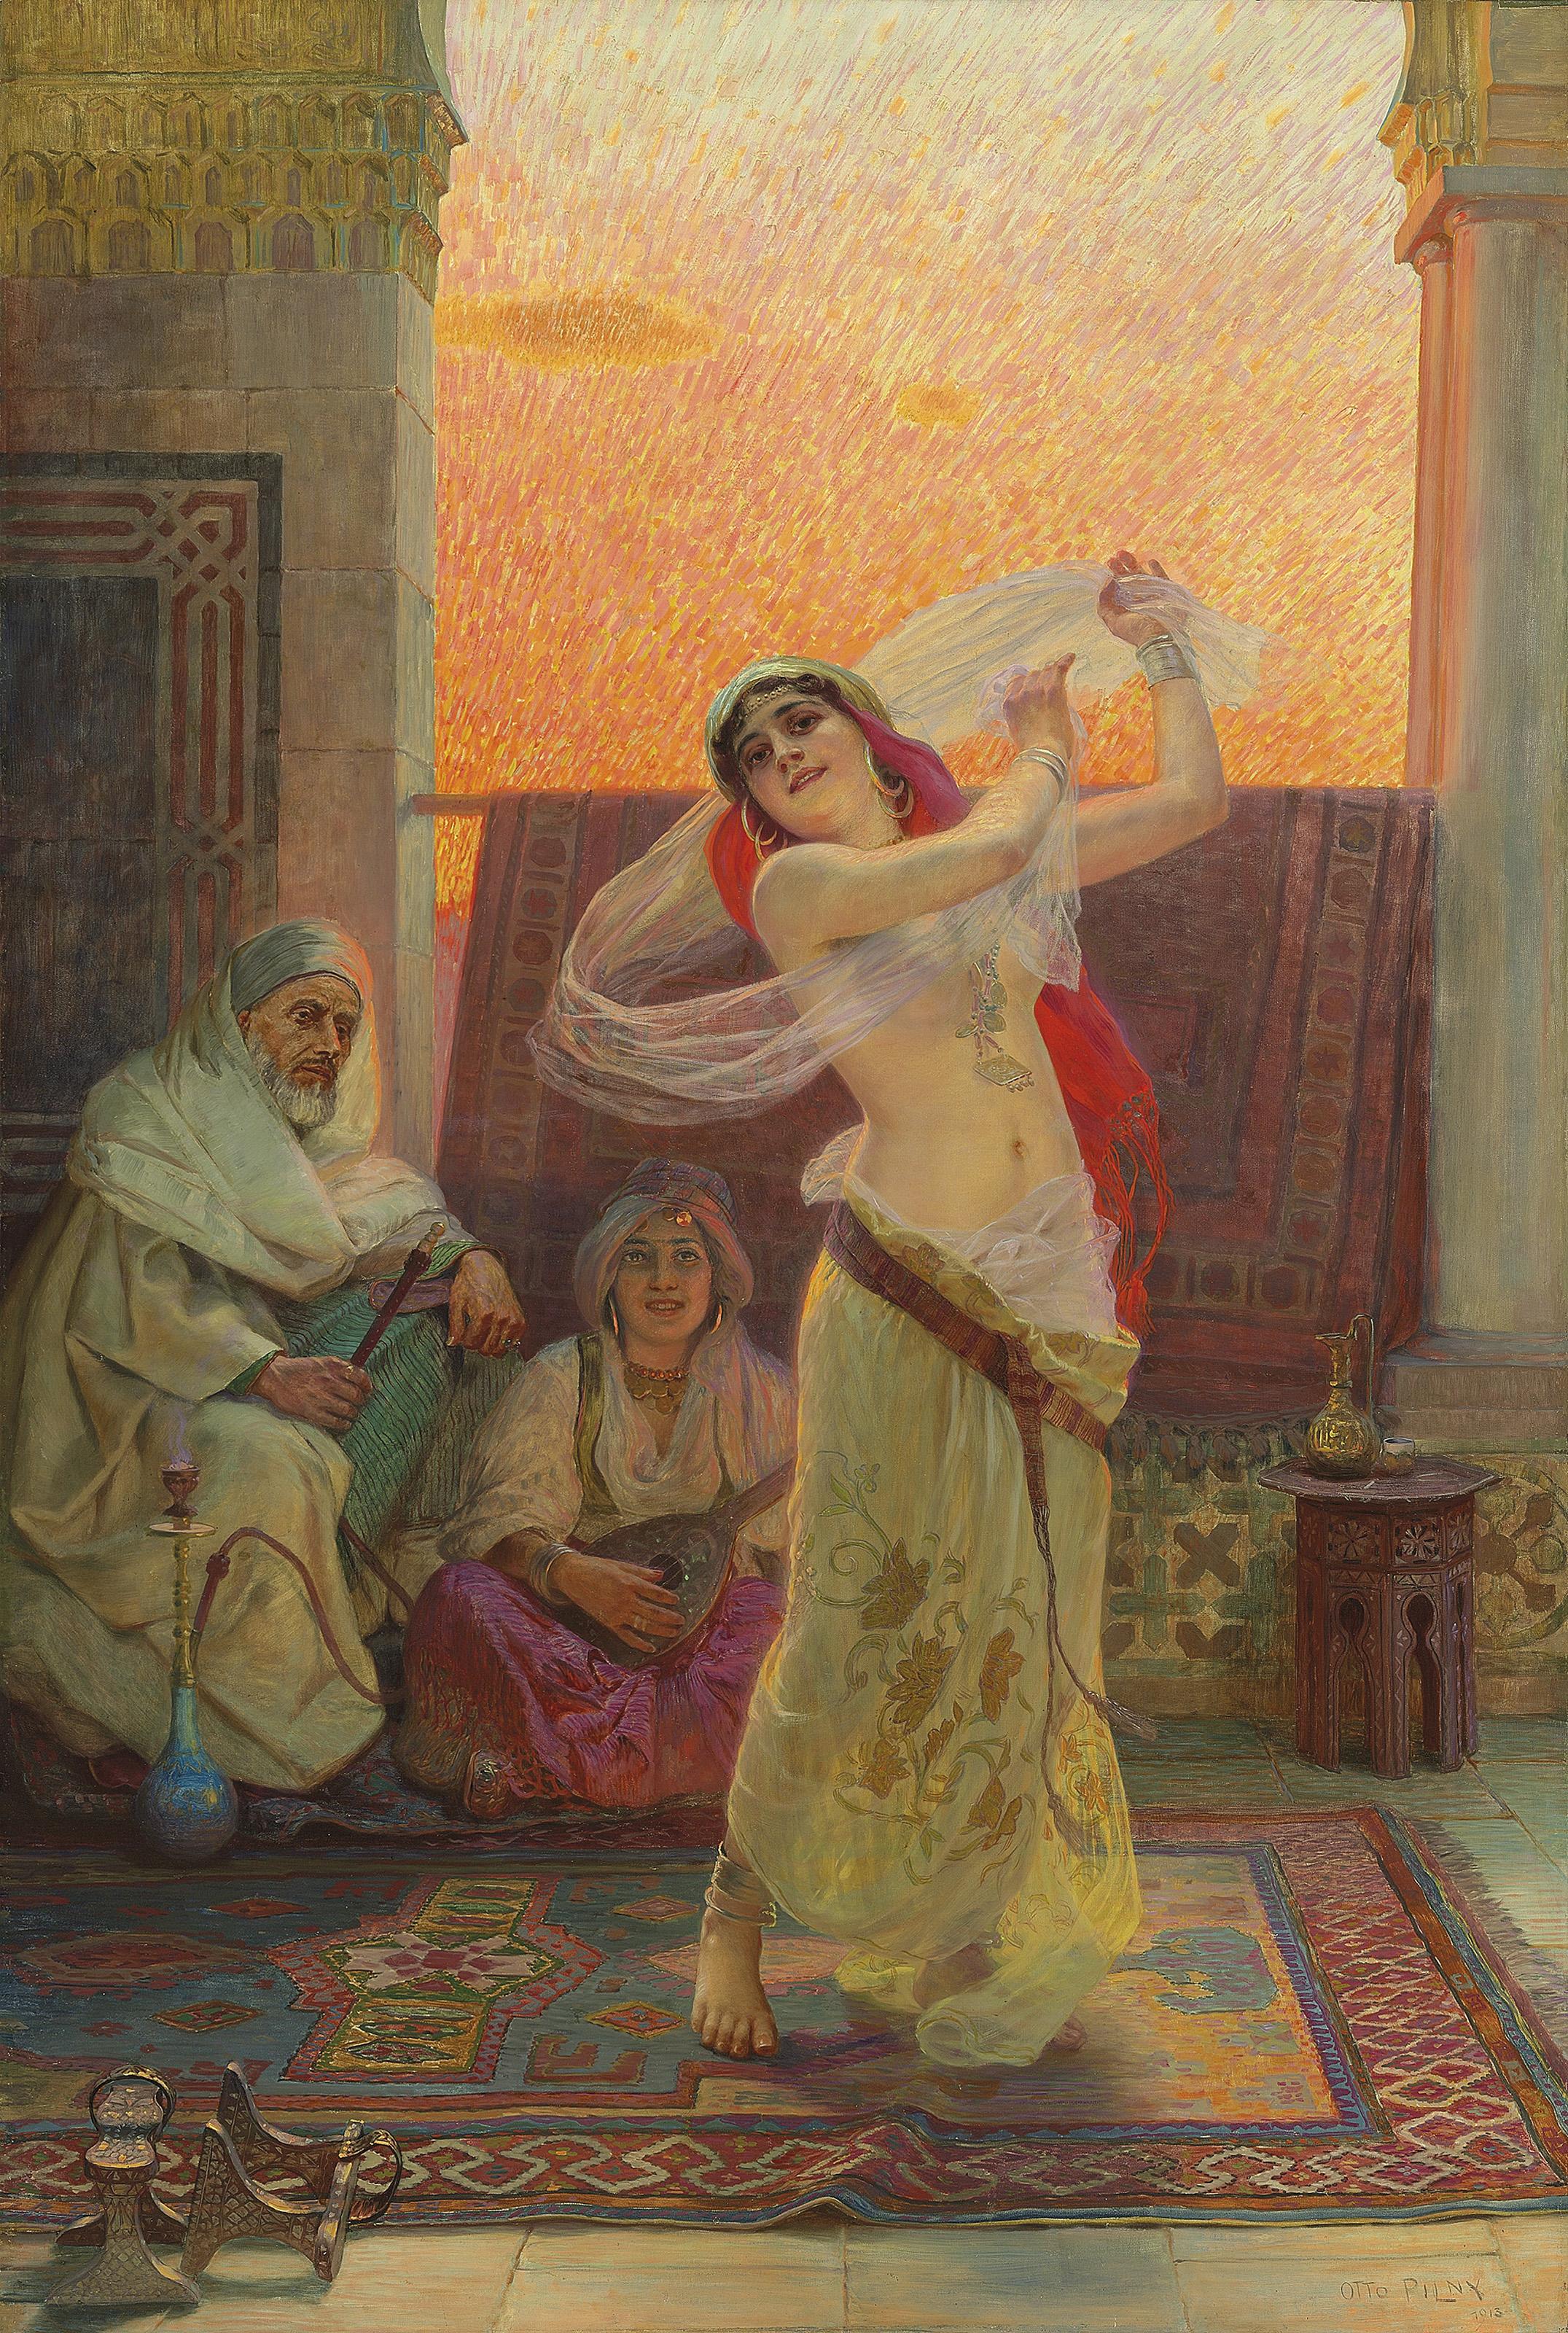 An Oriental Beauty dancing